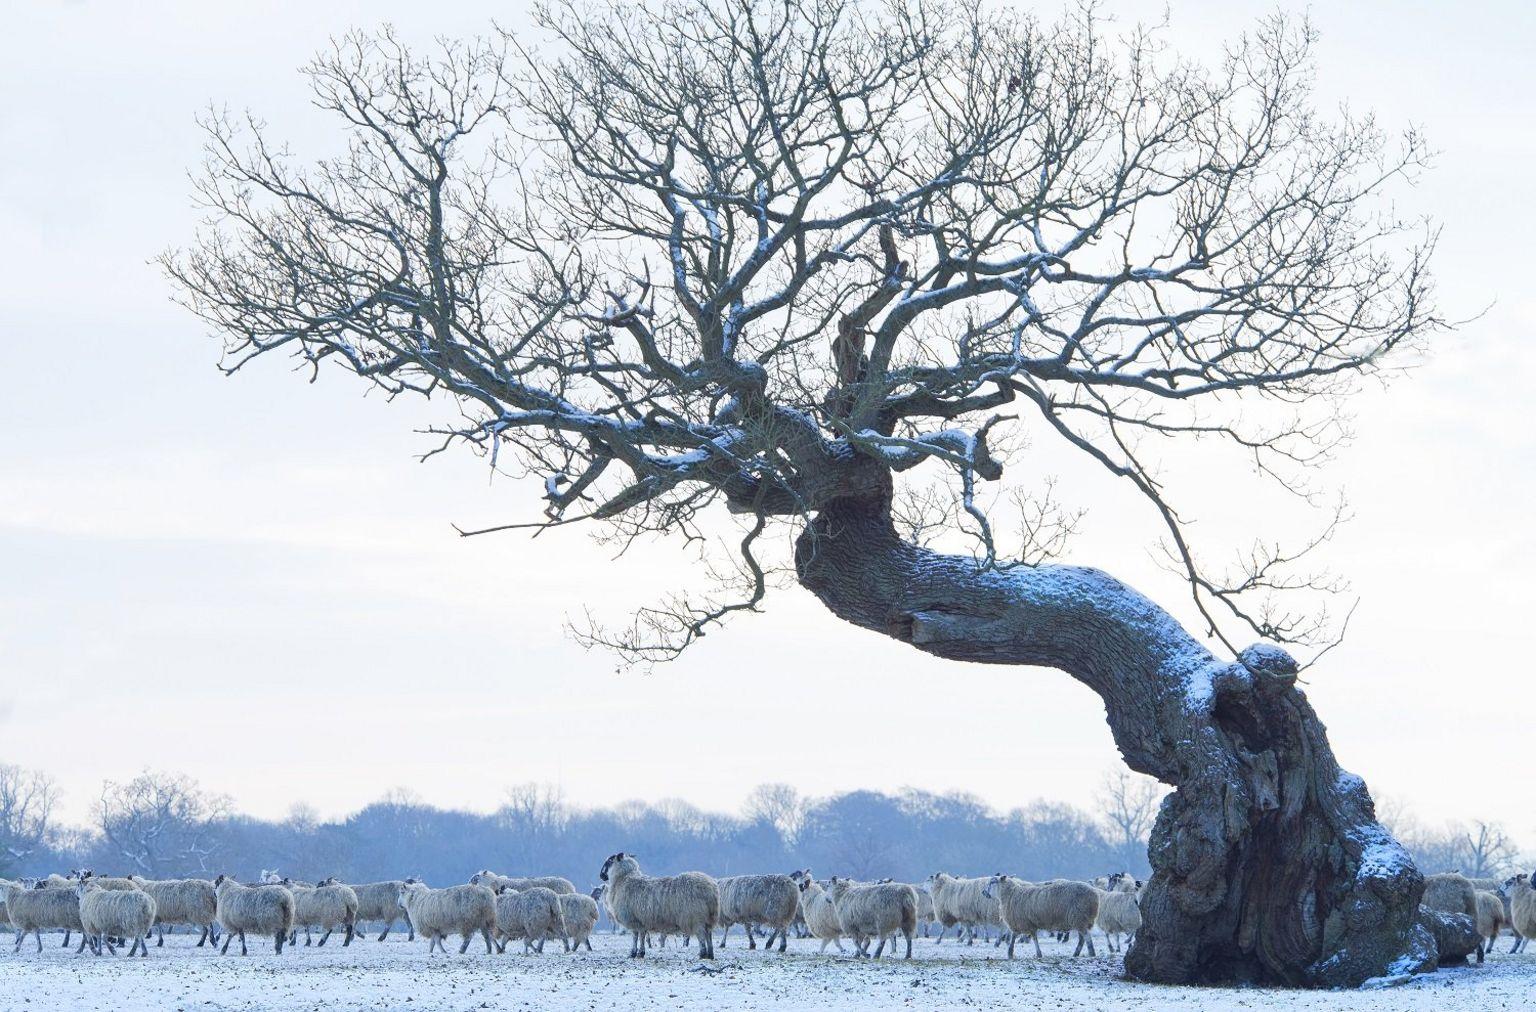 Snowy Sheep at Blenheim Palace